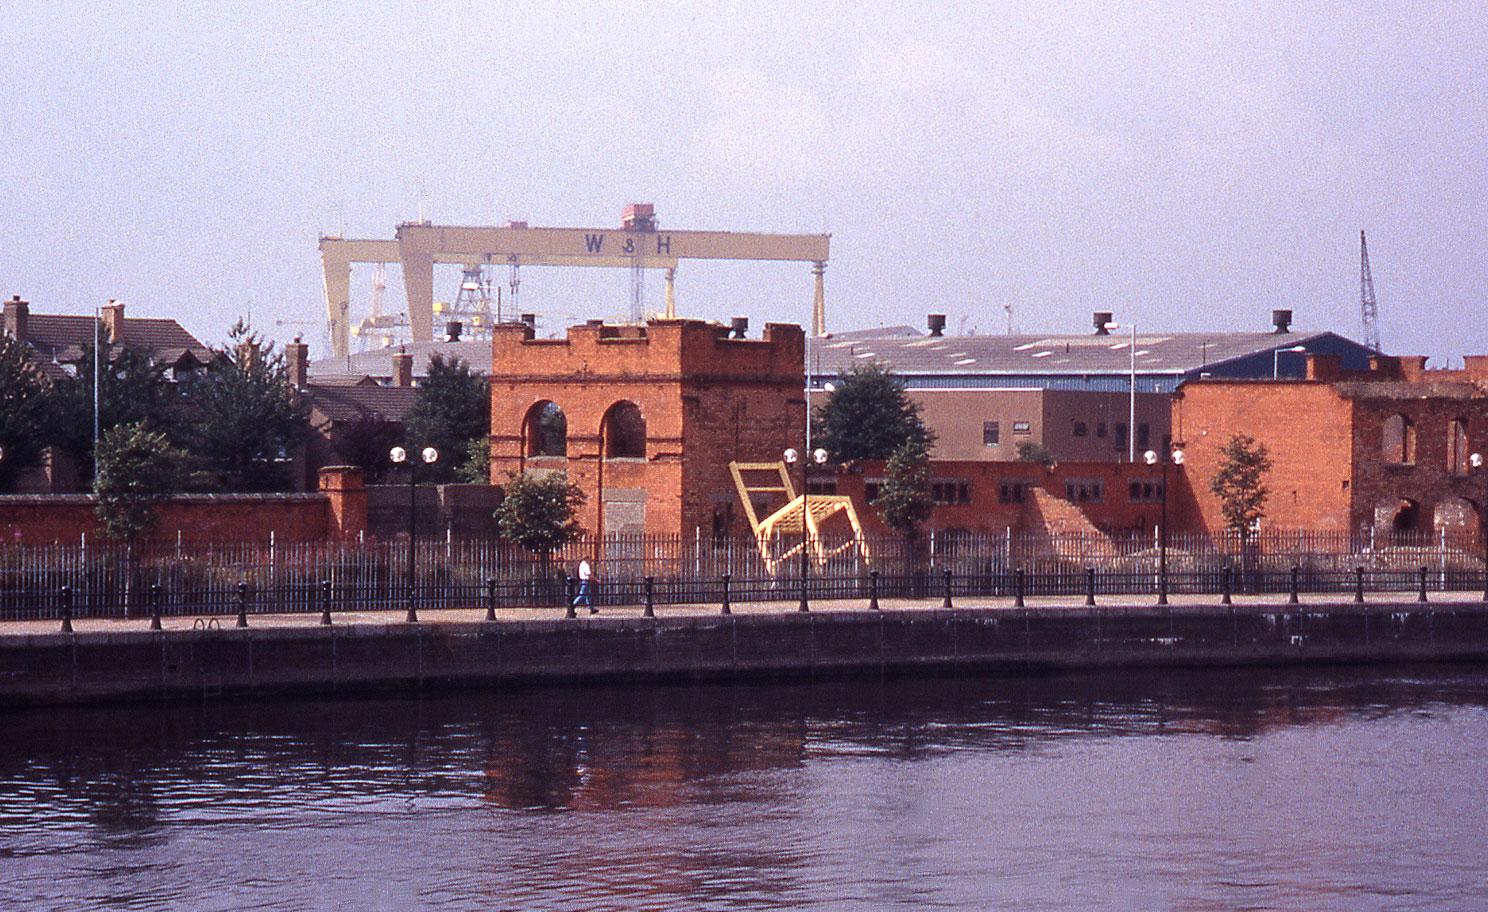 tom-gormally-sculpture-belfast-ireland-watching-river-flow.jpg